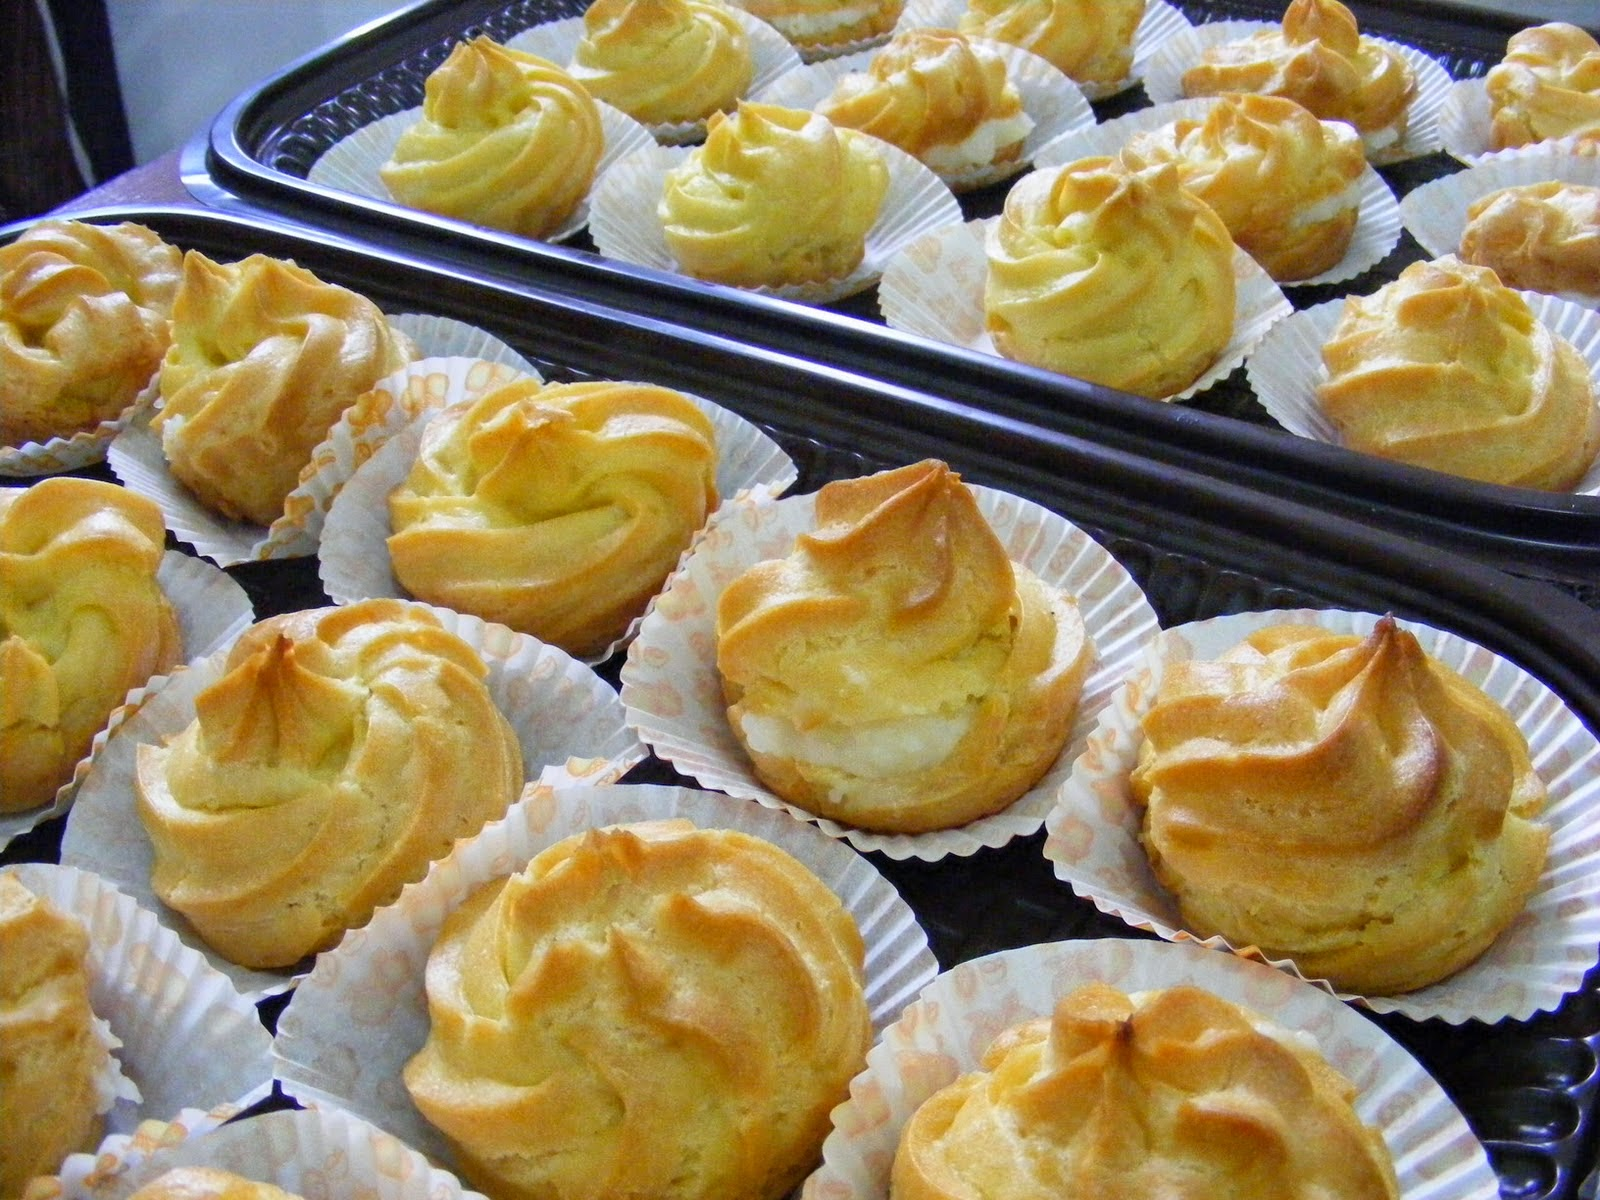 Resep Cara Membuat Kue Sus Basah Isi Vla Vanila Enak